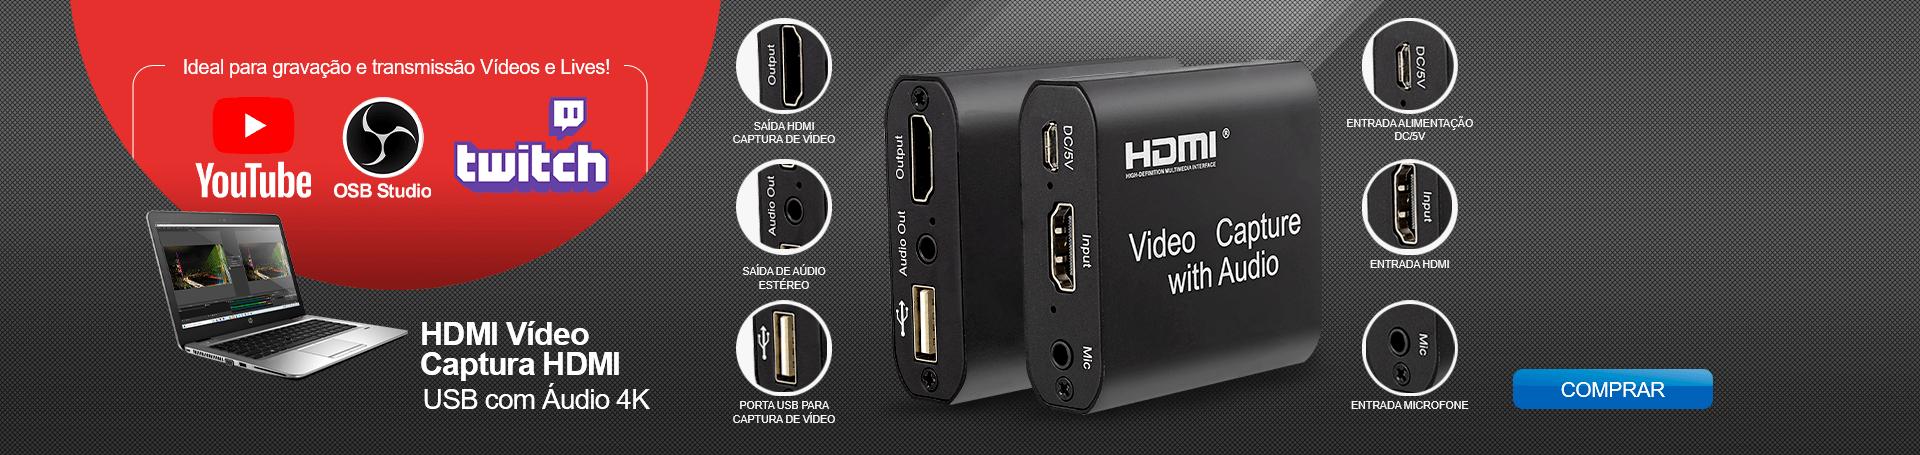 BANNER DESKTOP HOME - HDMI Vídeo Captura HDMI, USB com Áudio 4K